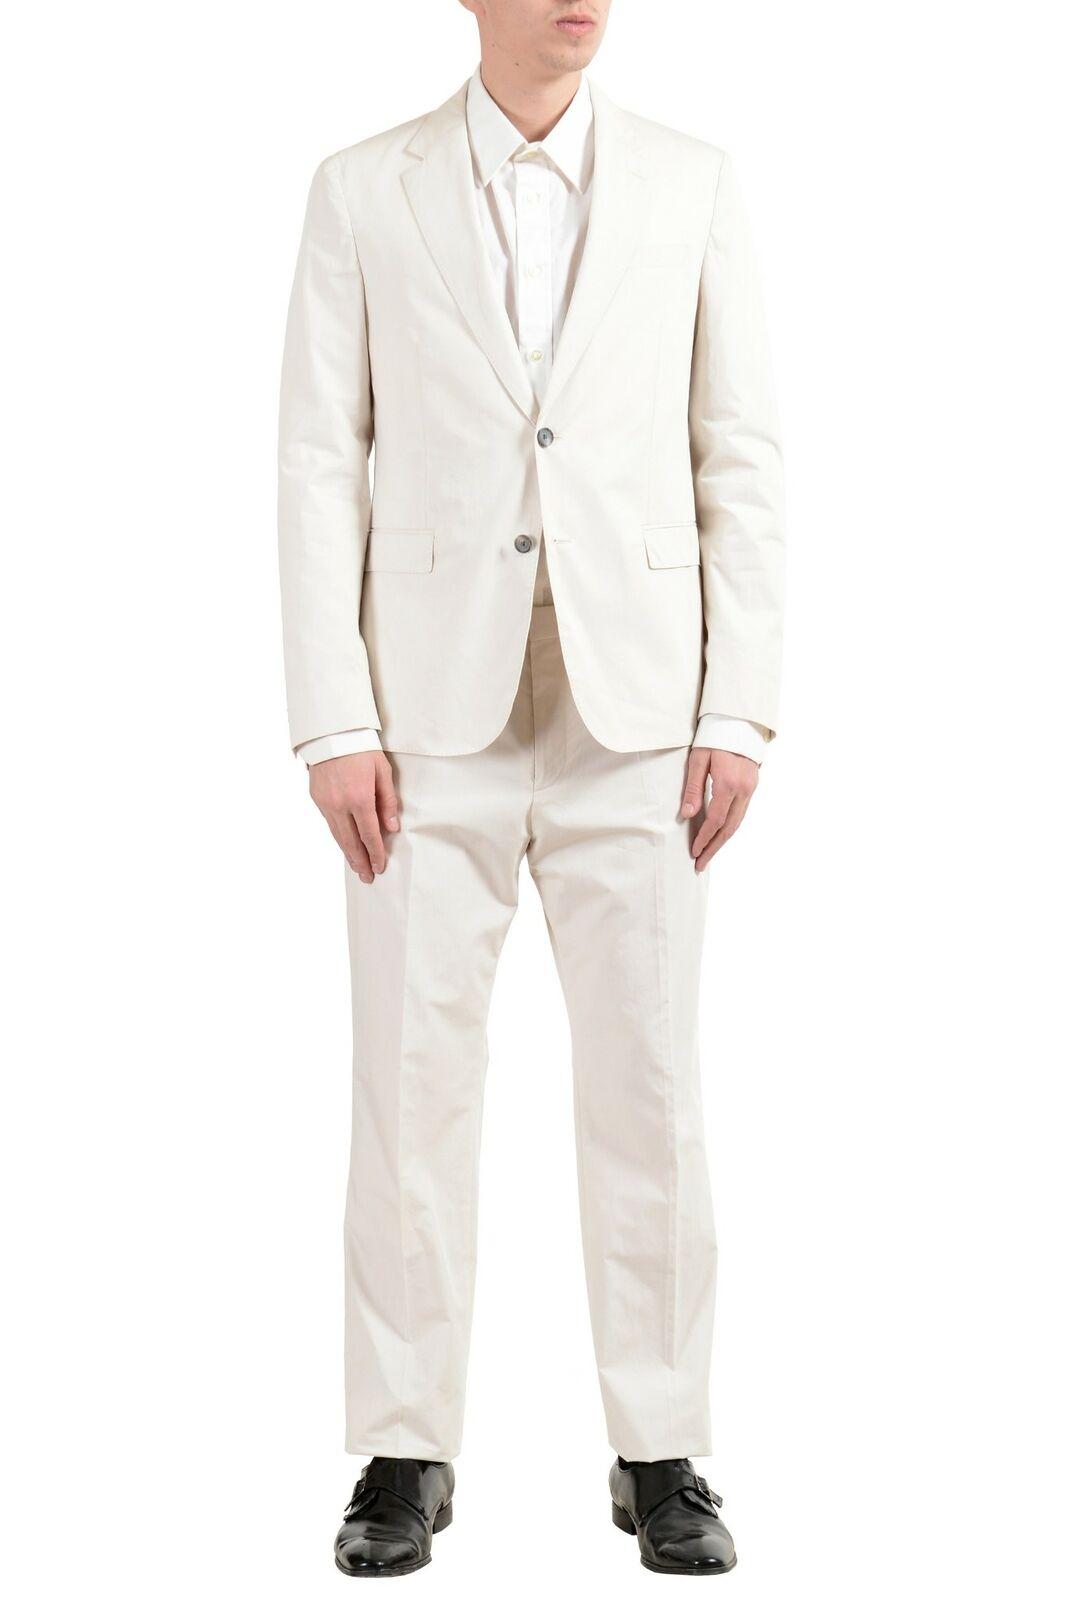 Hugo Boss  Nylen1 Pery1  Men's Off White Slim Two Button Suit